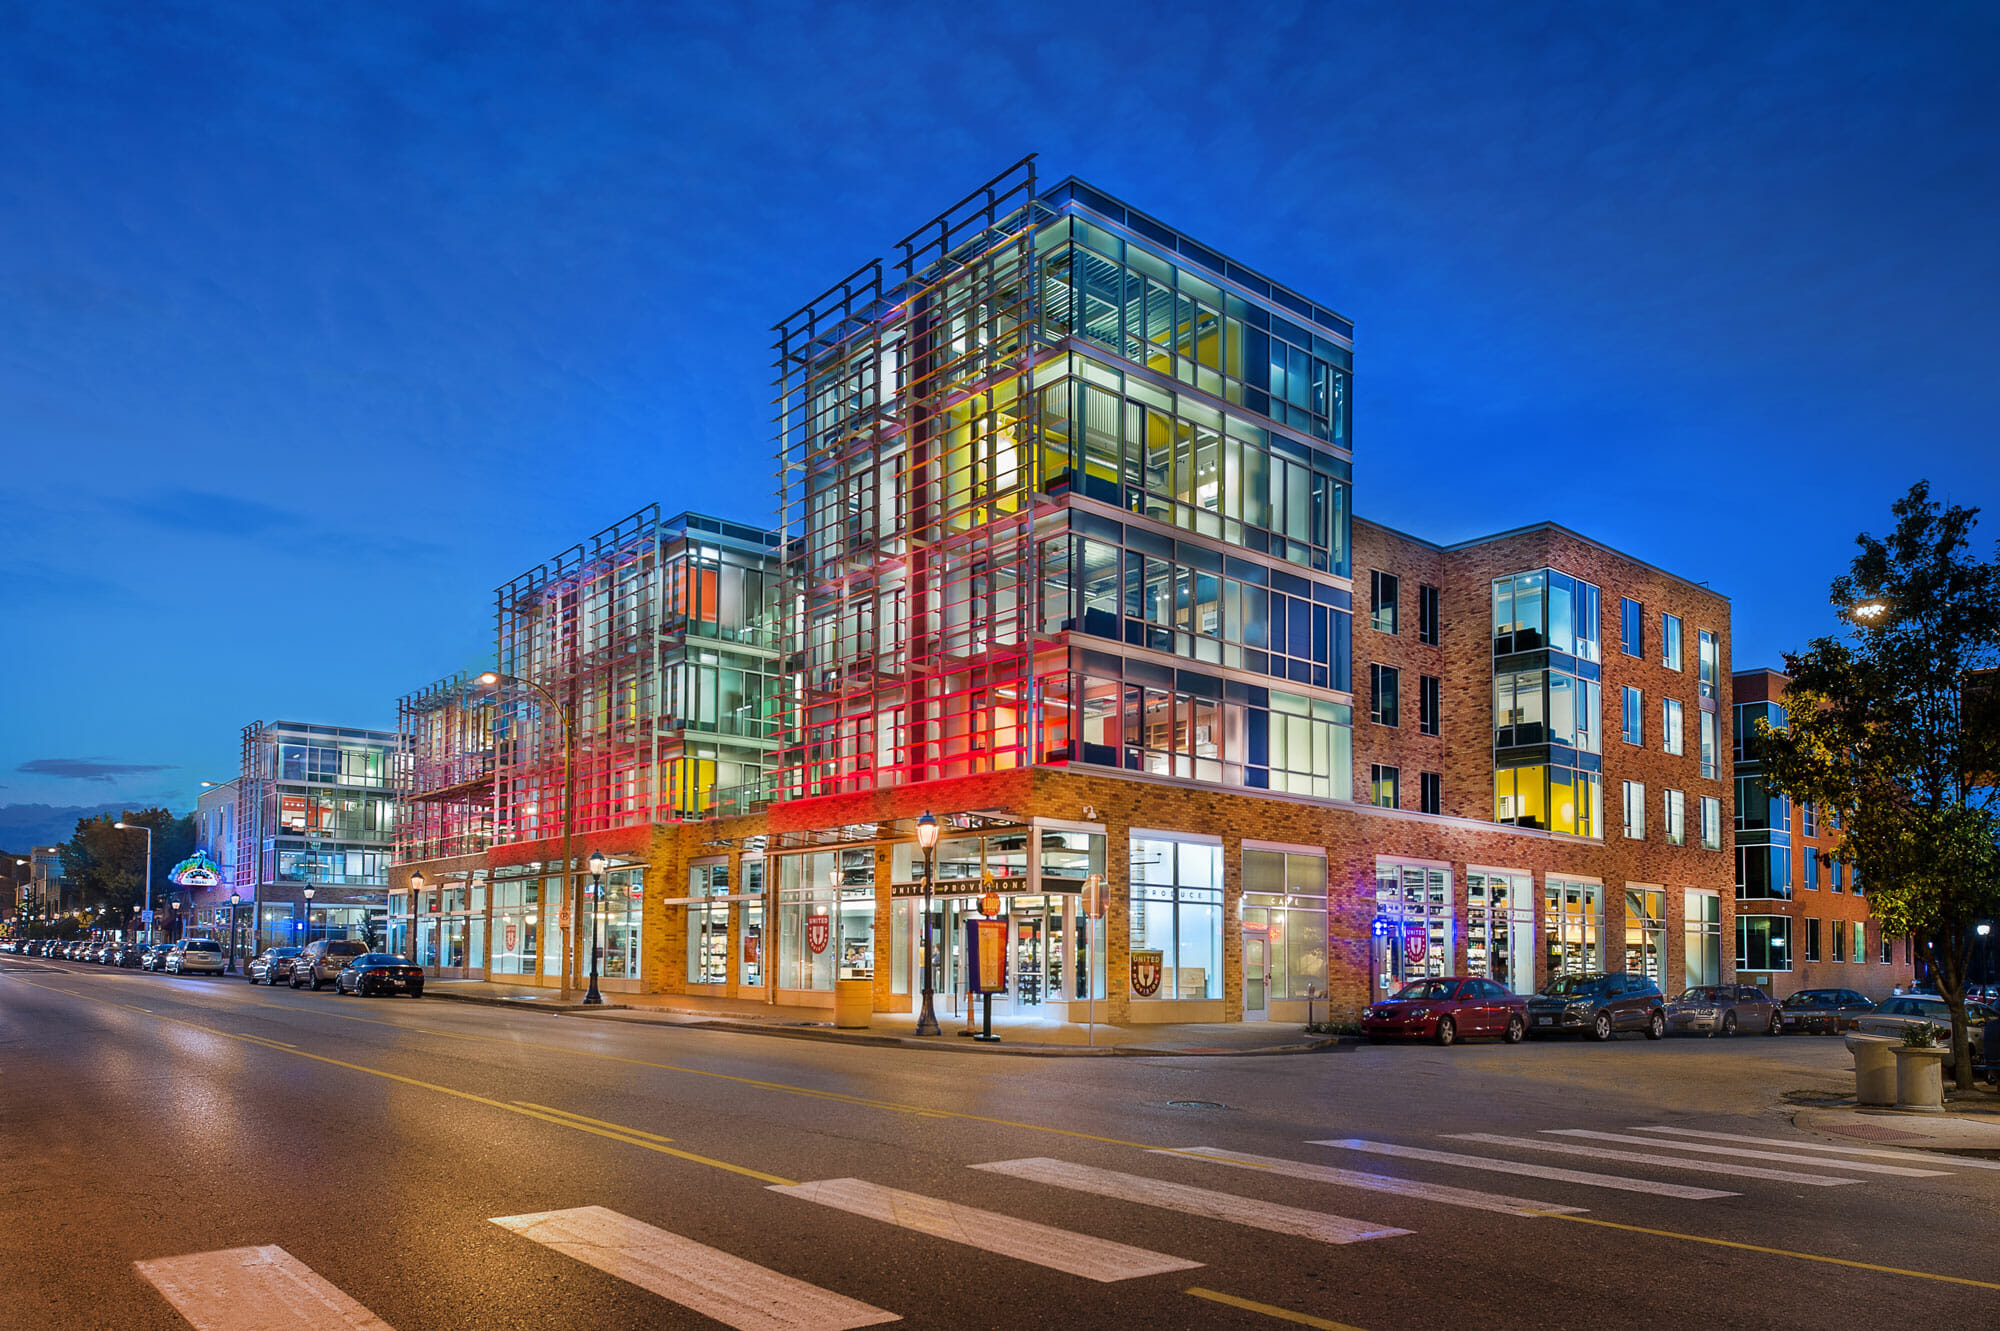 Washington University Loop Student Housing